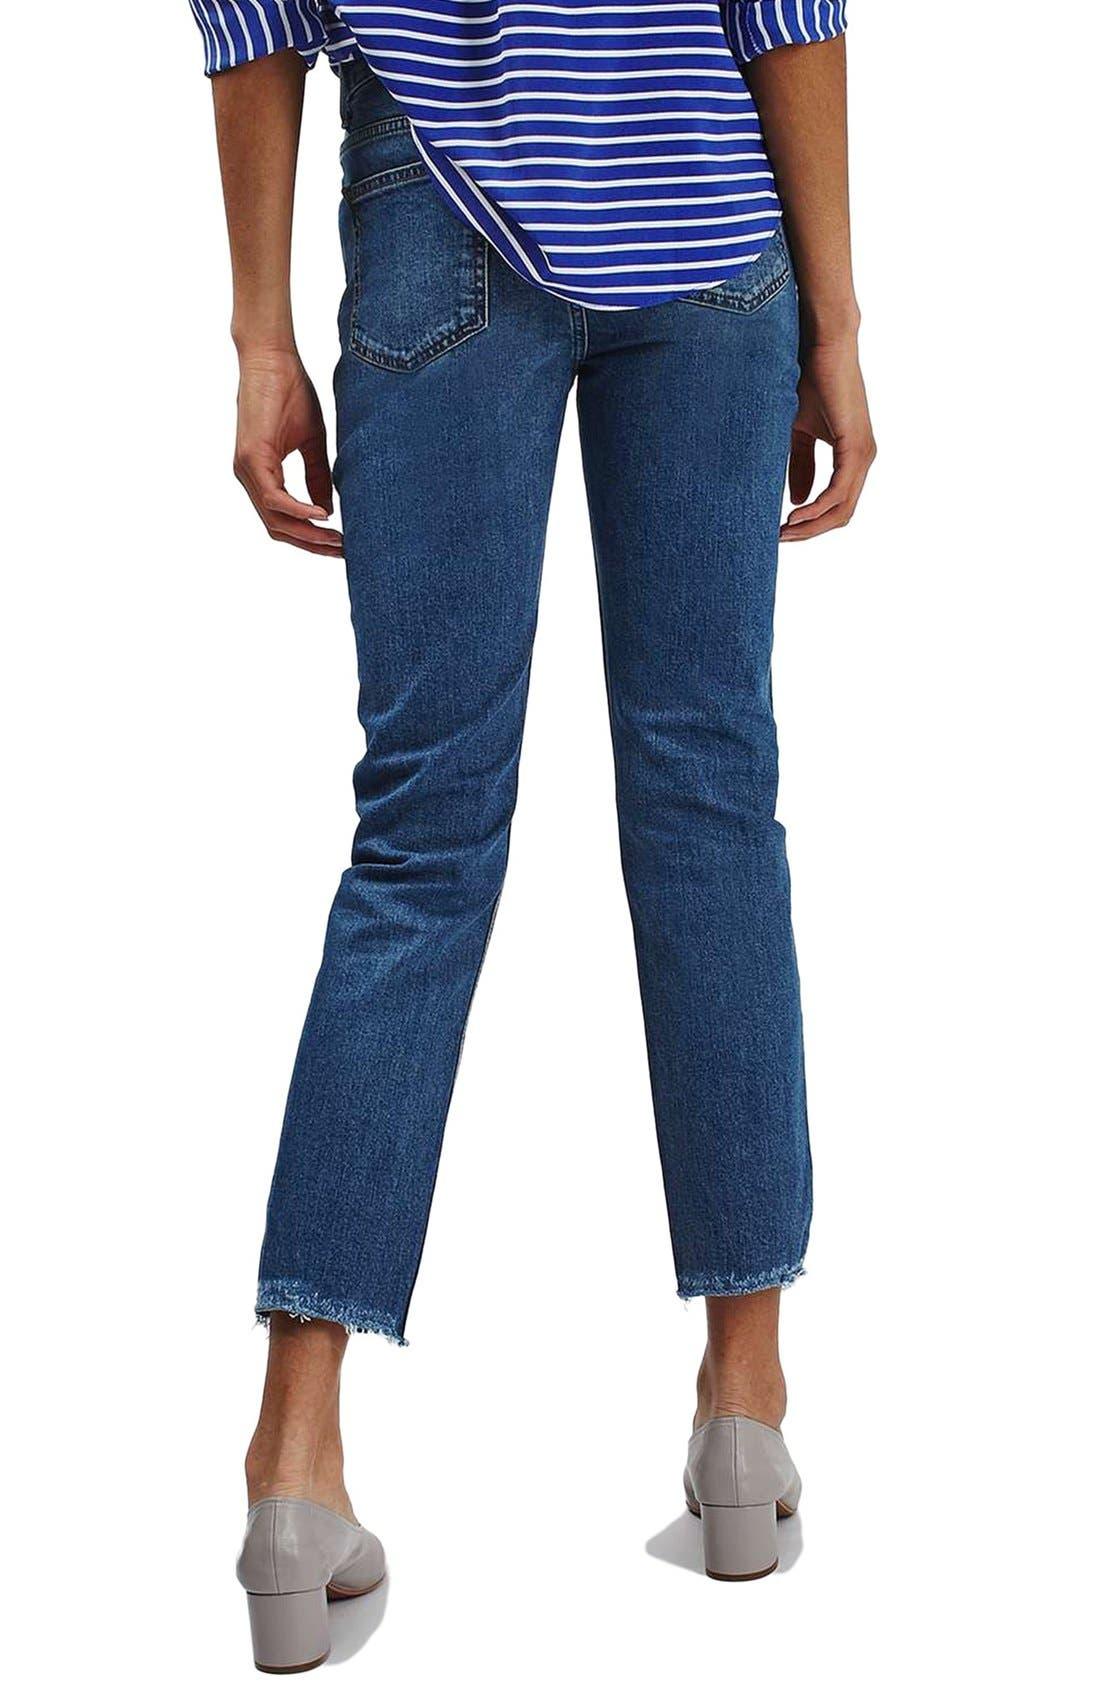 TOPSHOP, Raw Hem Straight Leg Jeans, Alternate thumbnail 2, color, 401